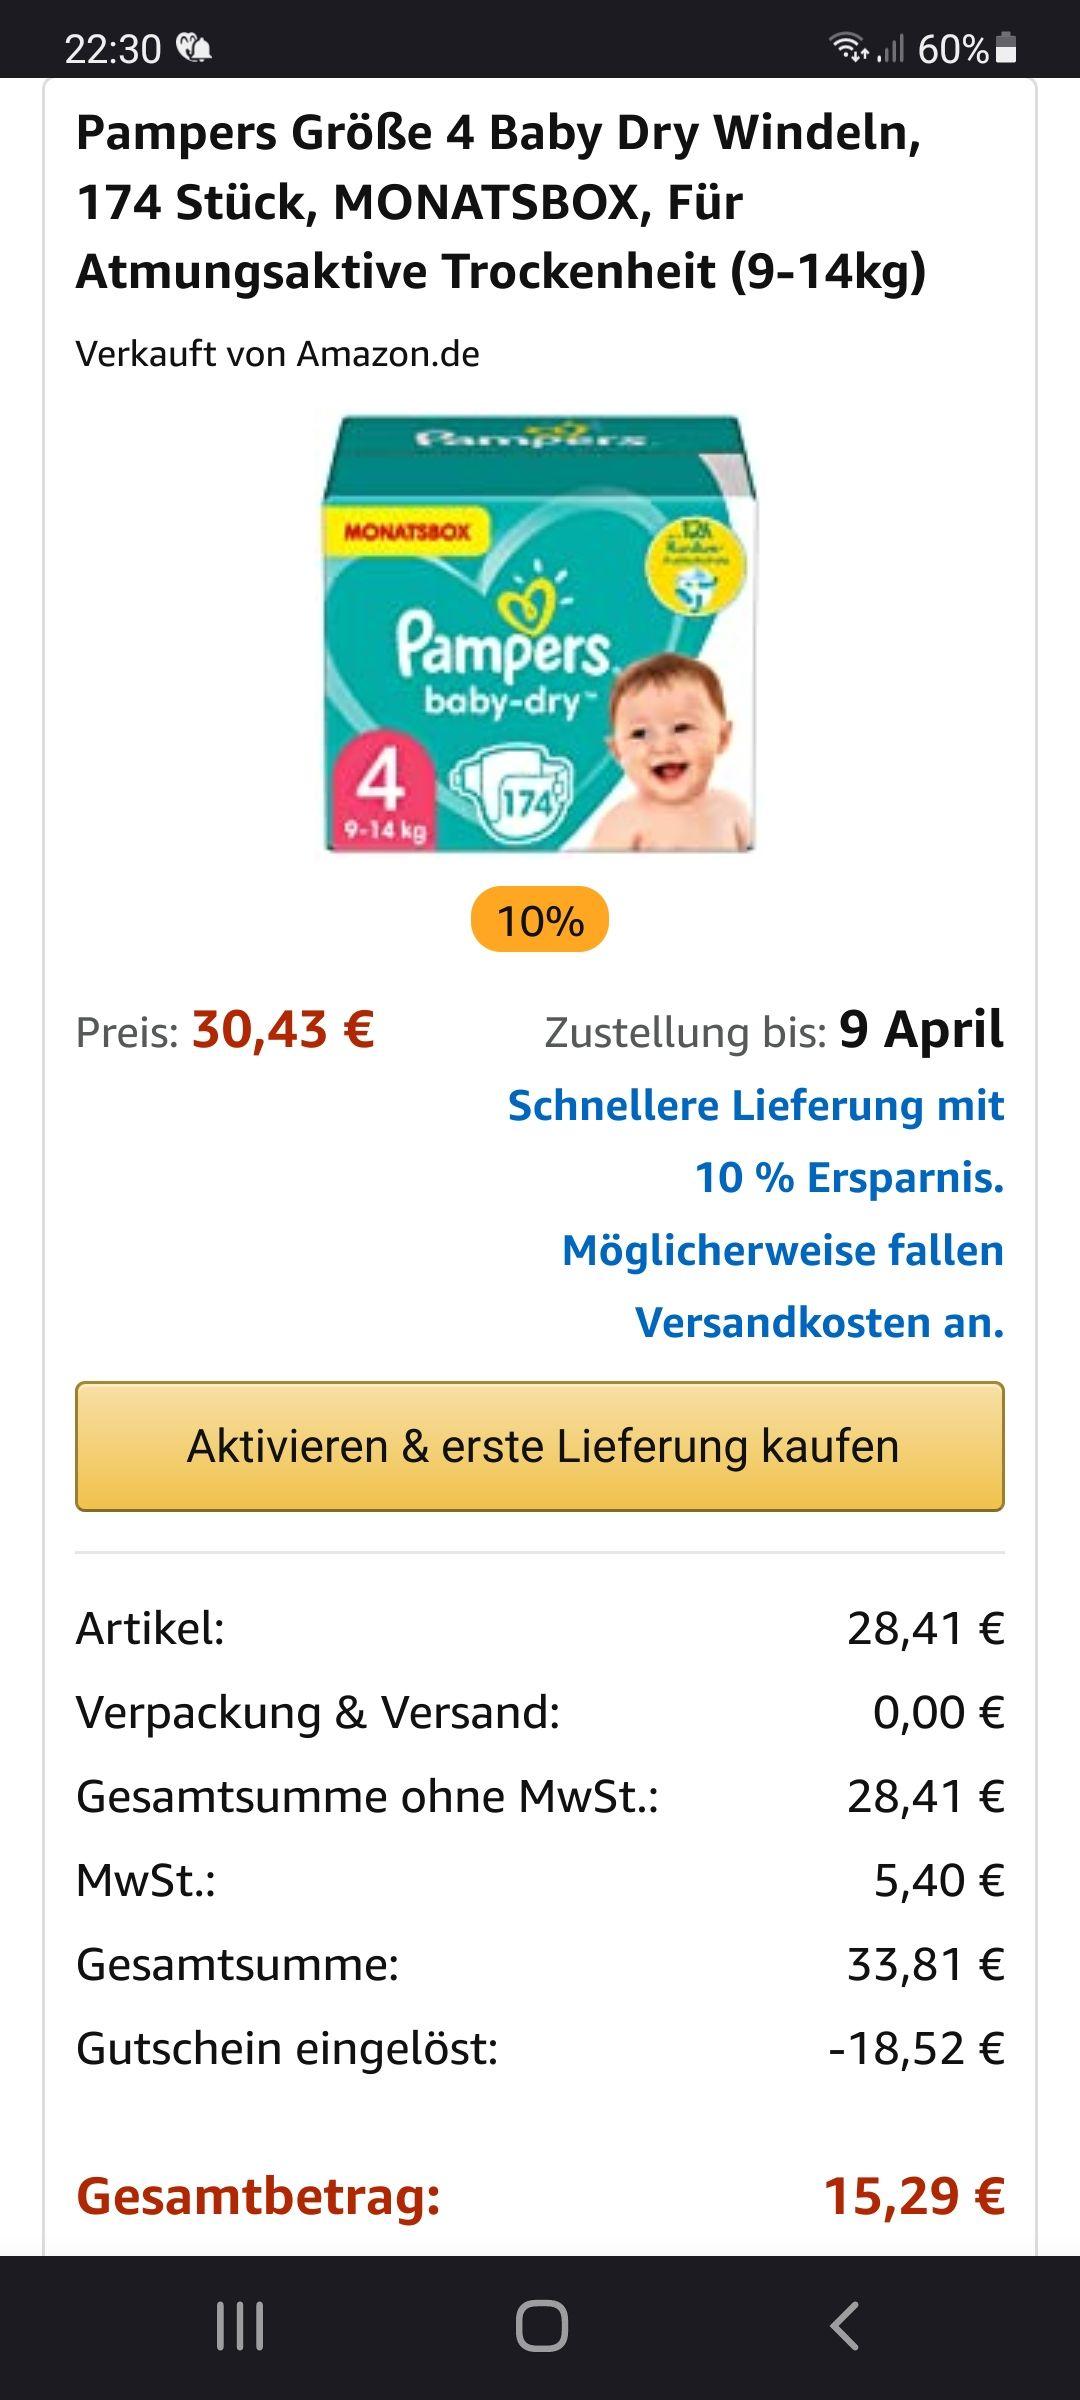 Pampers BabyDry Gr. 4 für 8,60c - 12,6c je Windel mit Amazon SparAbo - personalisiert